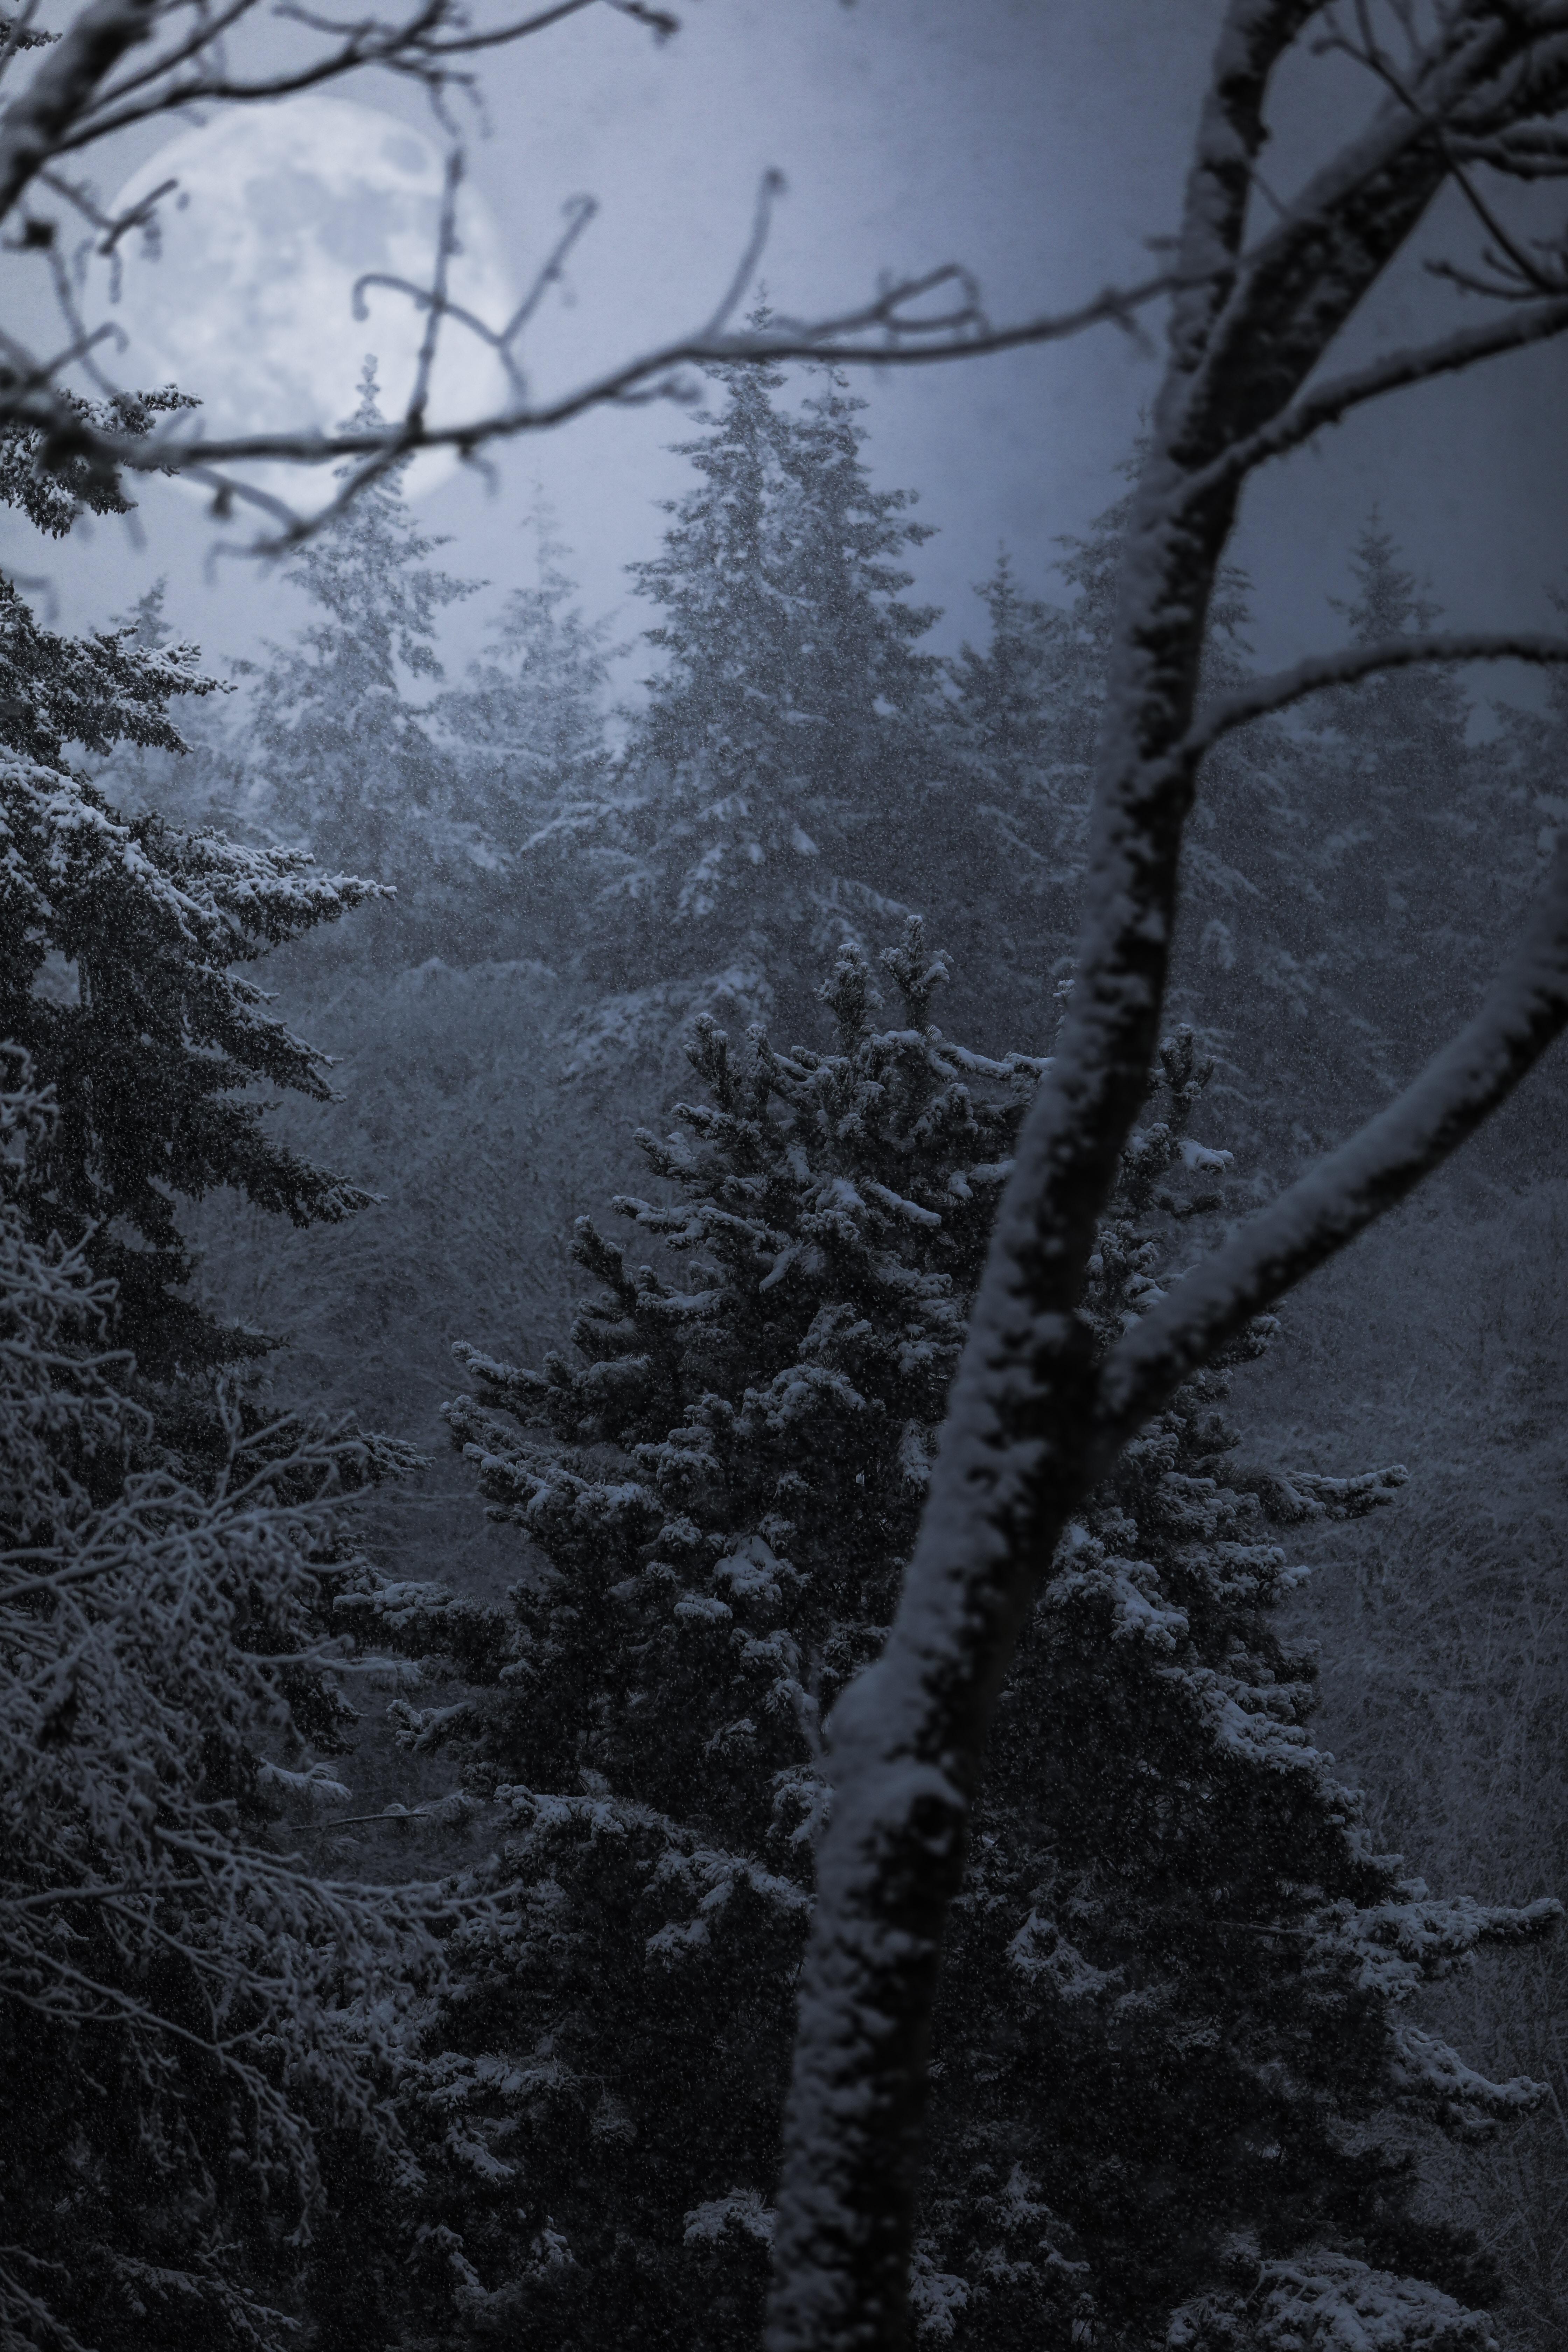 trees coated snow